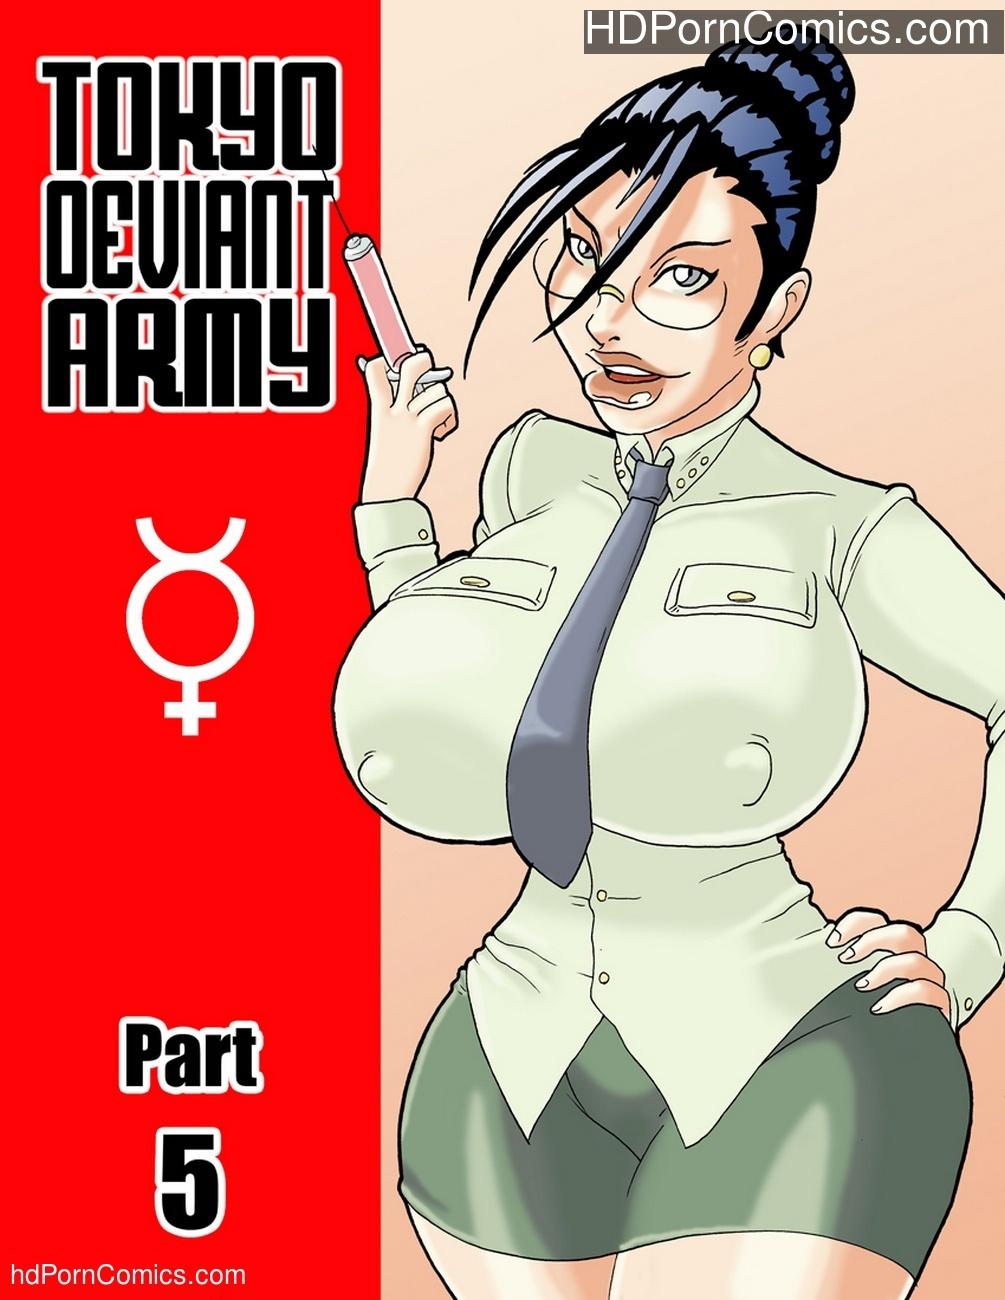 Tokyo Deviant Army 5 Sex Comic